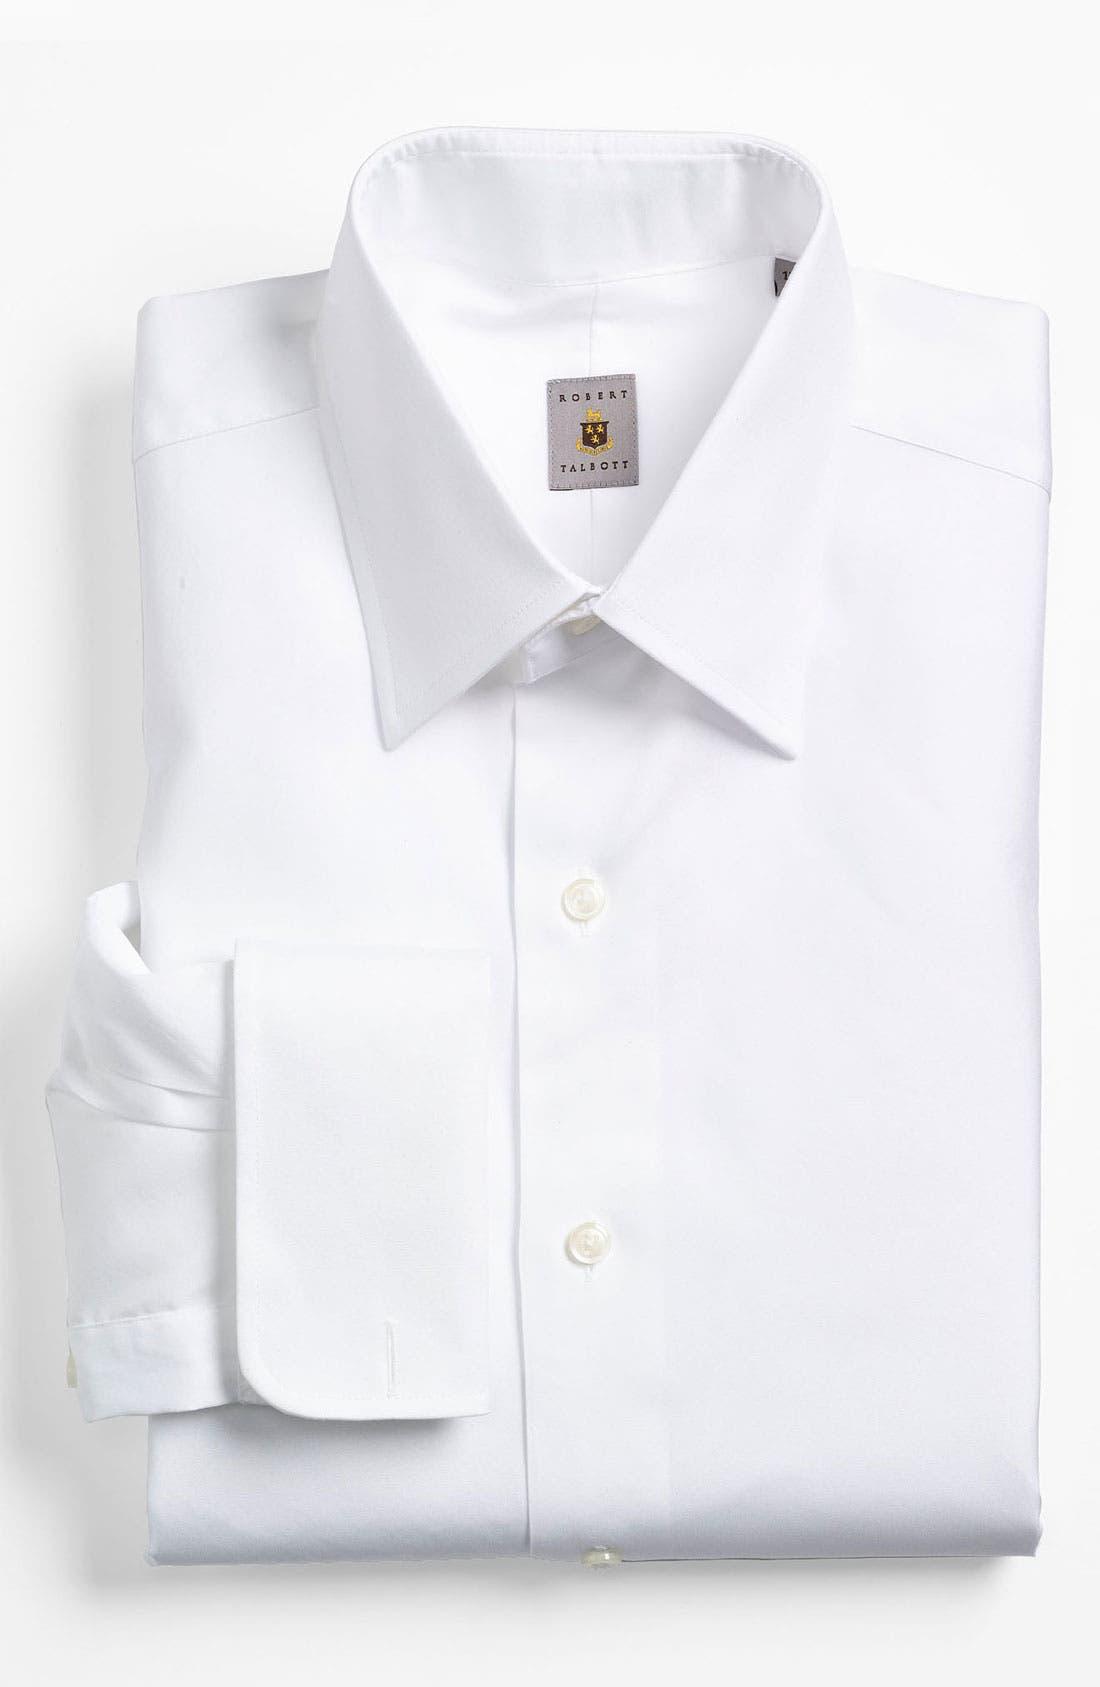 Main Image - Robert Talbott Classic Fit Tuxedo Shirt (Online Only)